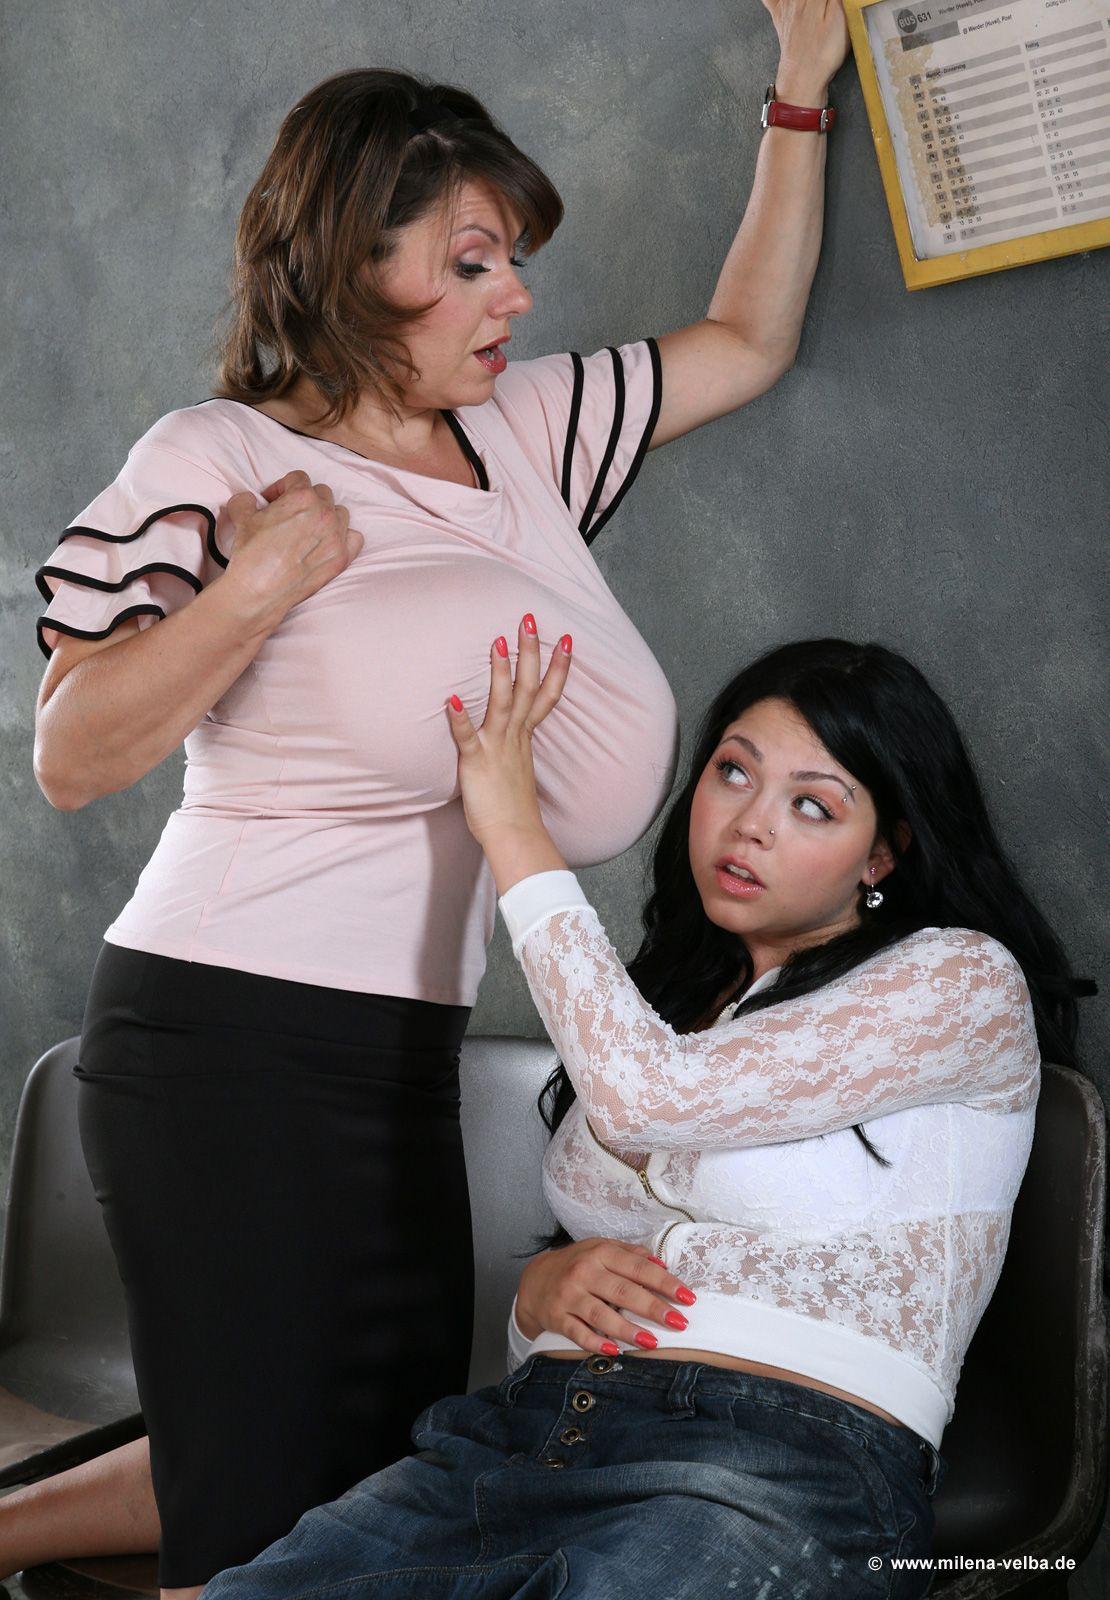 Lesbian girls holding breast